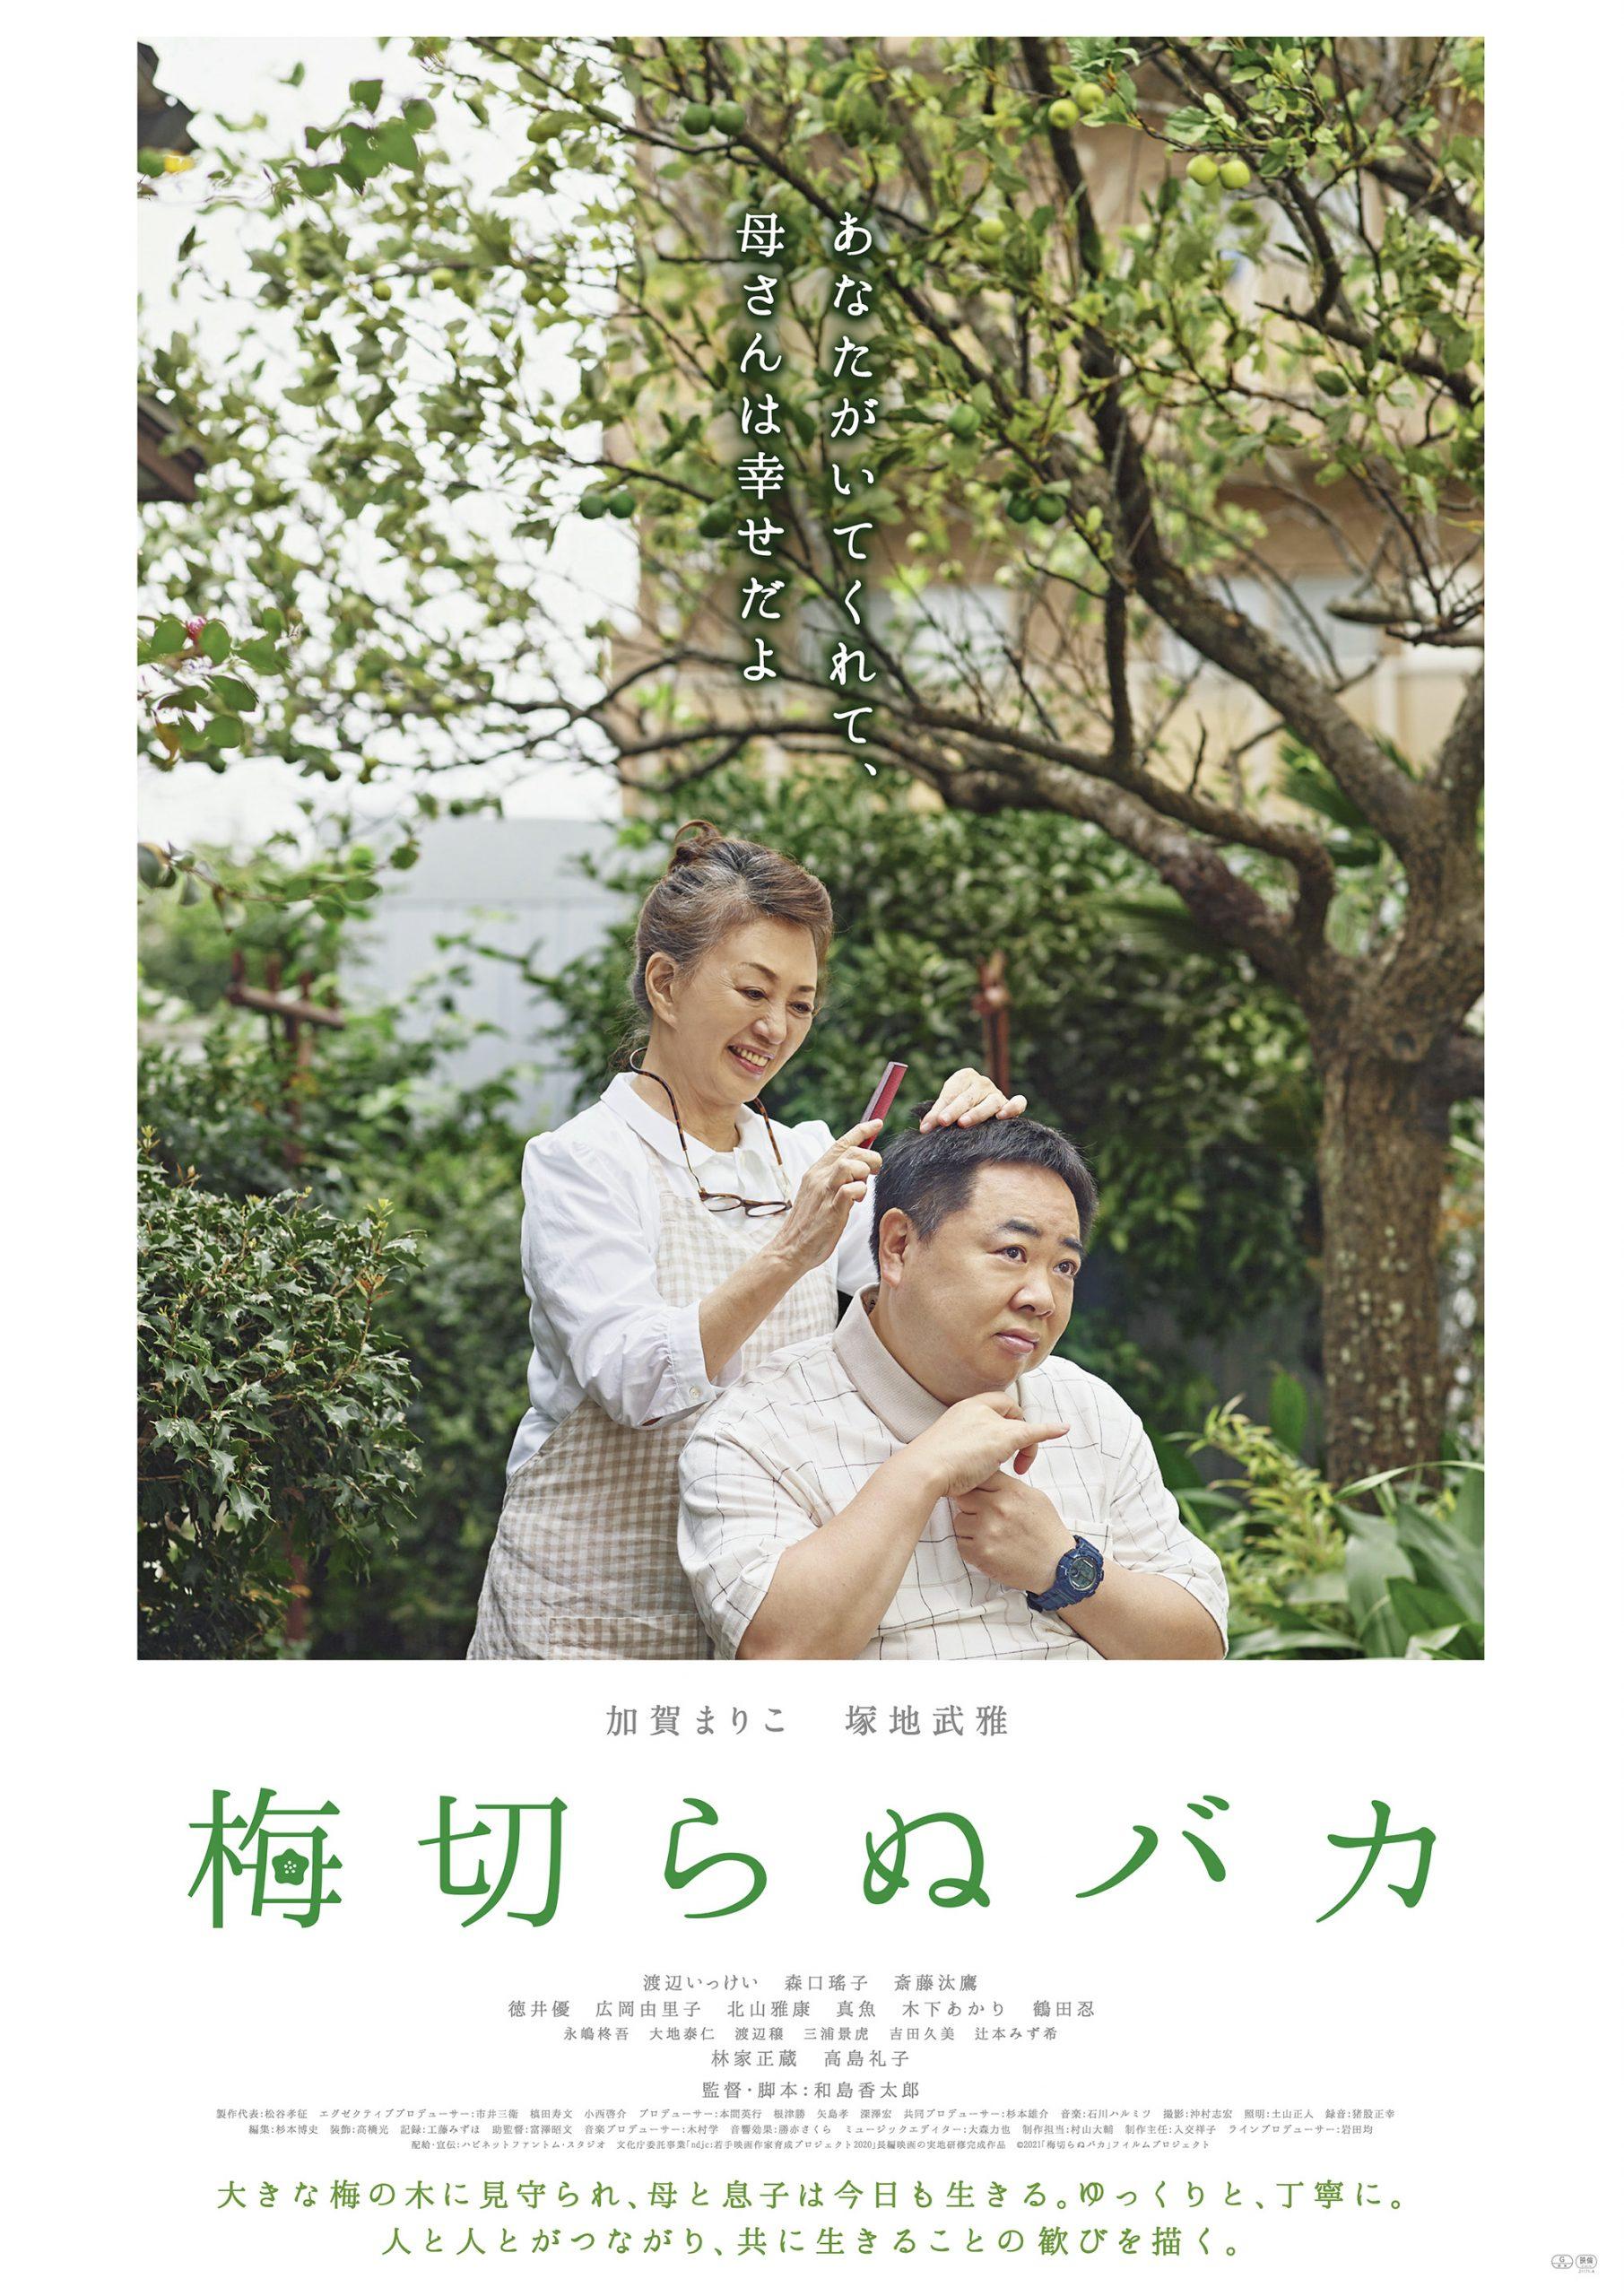 https://cineswitch.com/wp-content/uploads/2021/09/「梅切らぬバカ」-scaled.jpg